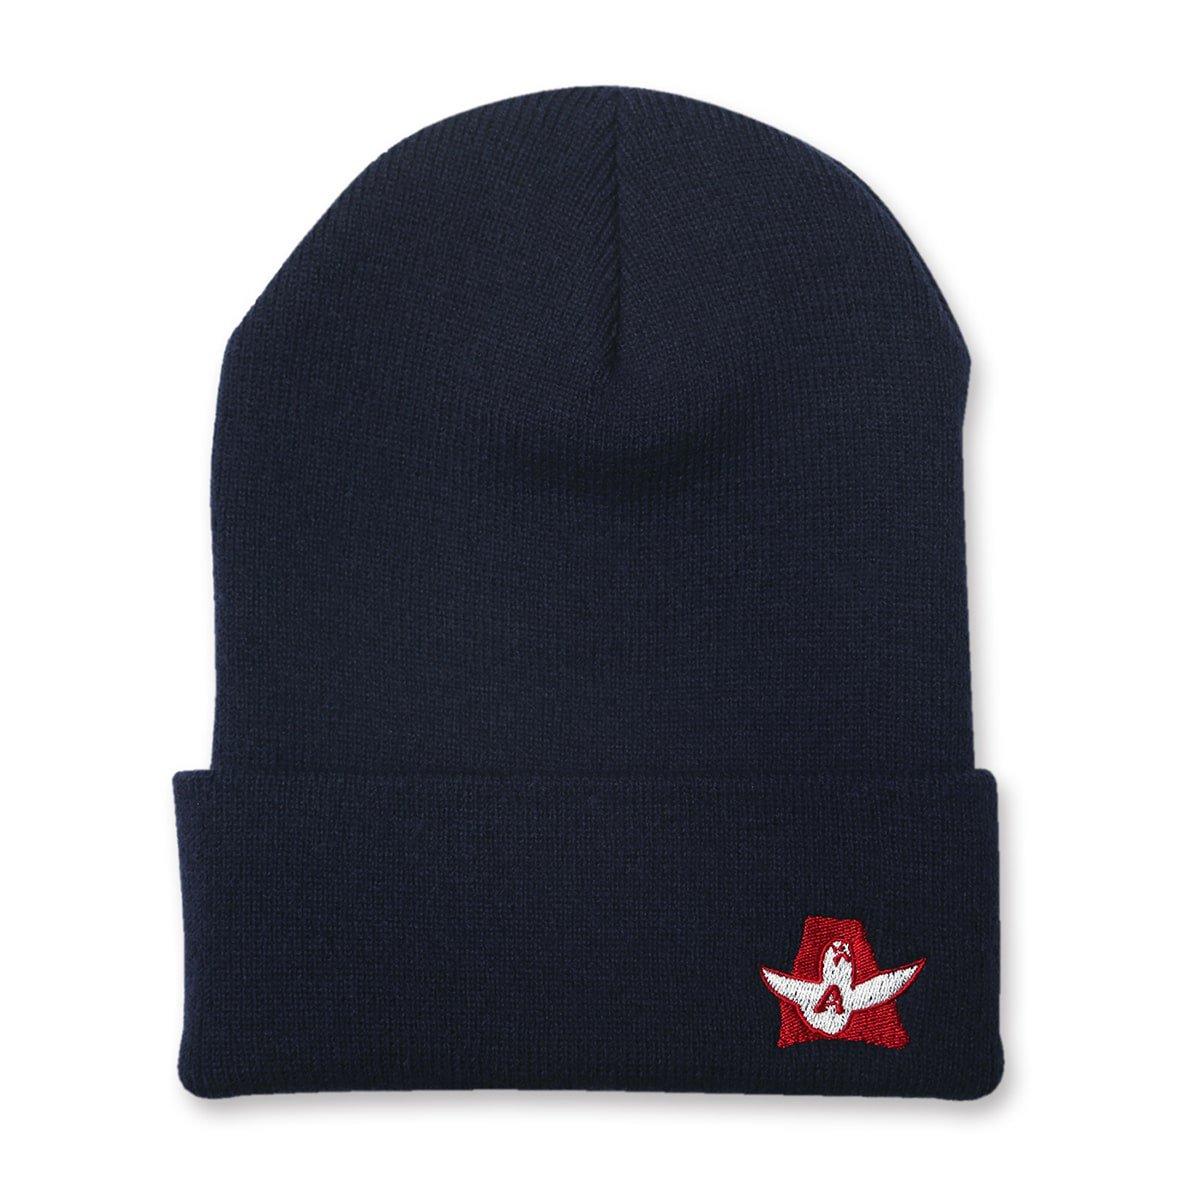 Mark Gonzales x Arch logo beanie【navy】